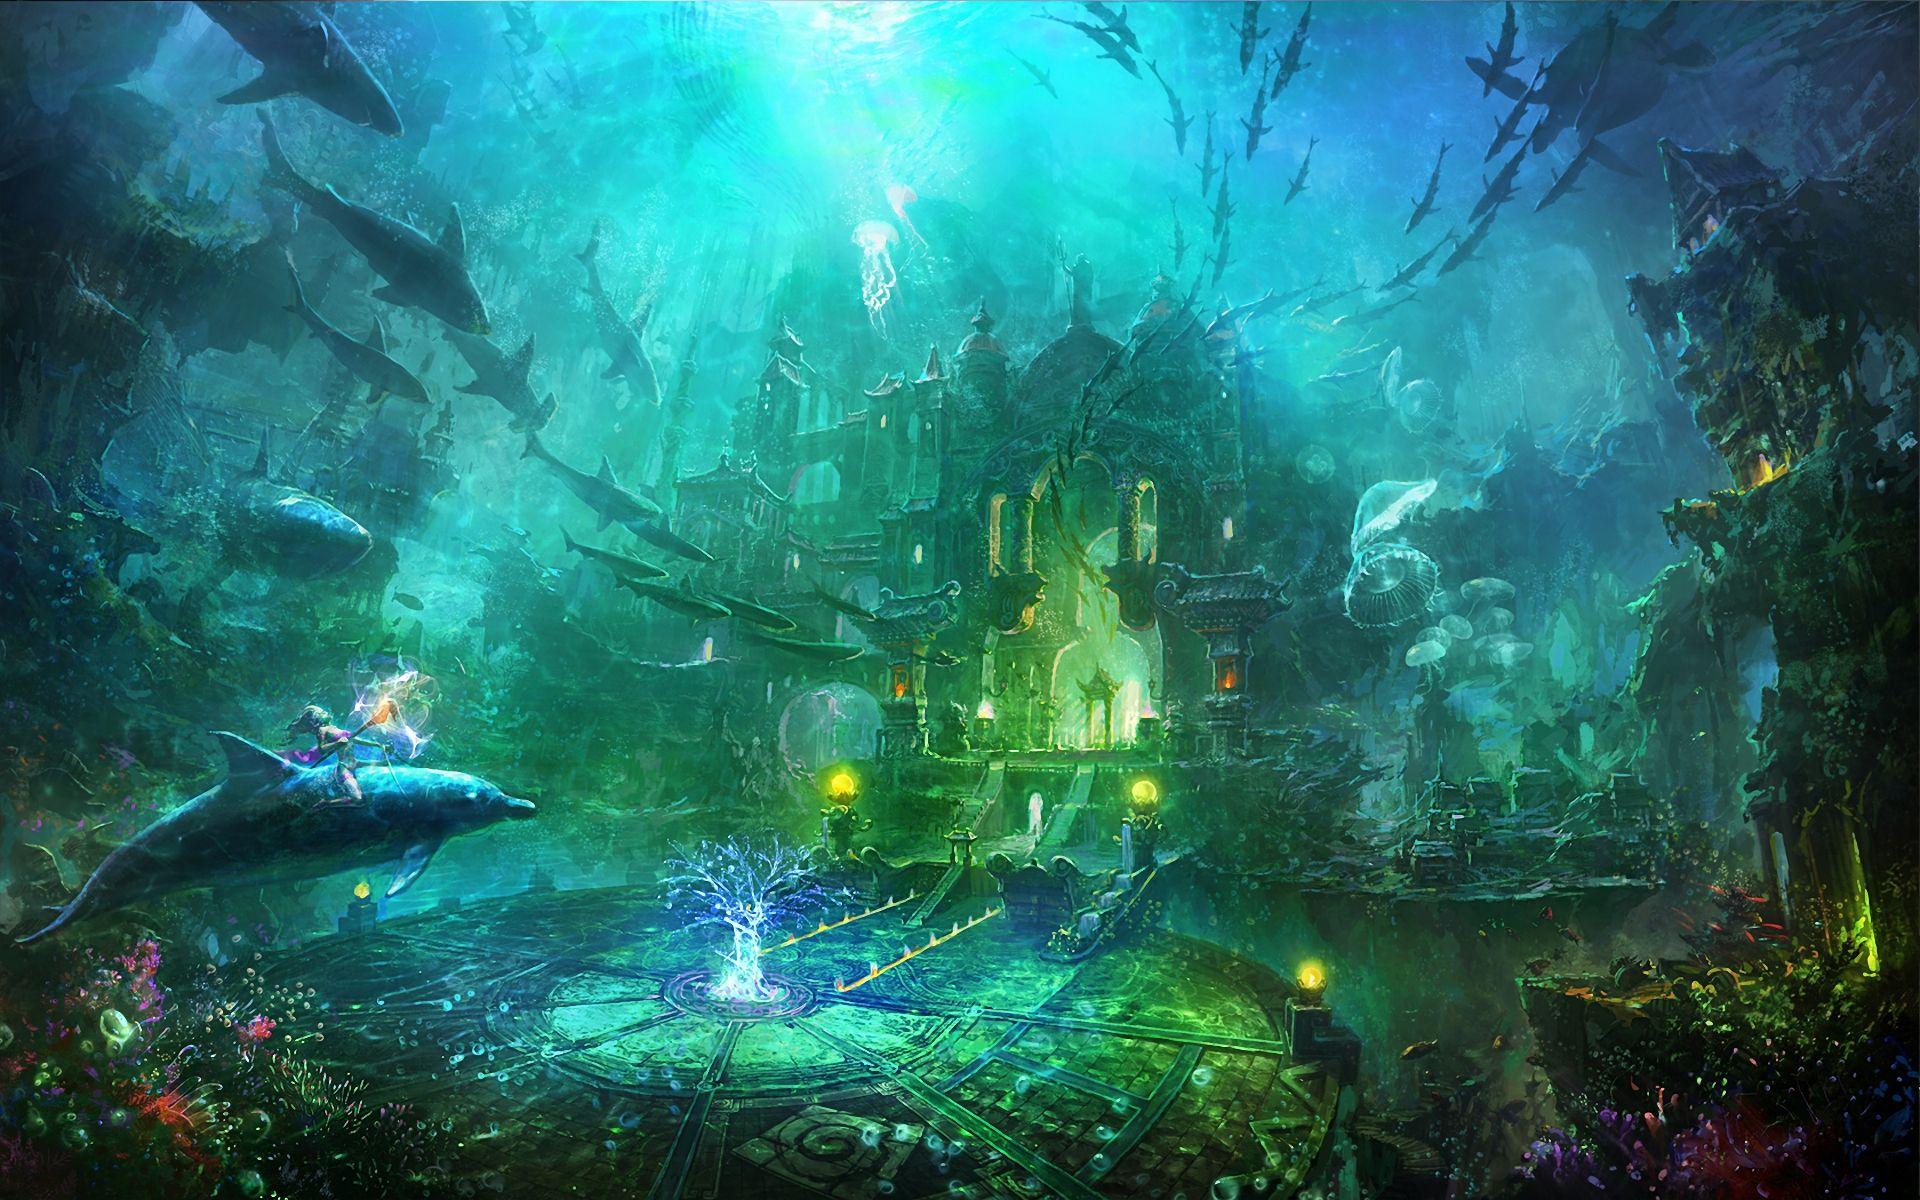 Atalanta Lost Fantasy Art Landscapes Underwater City Underwater World